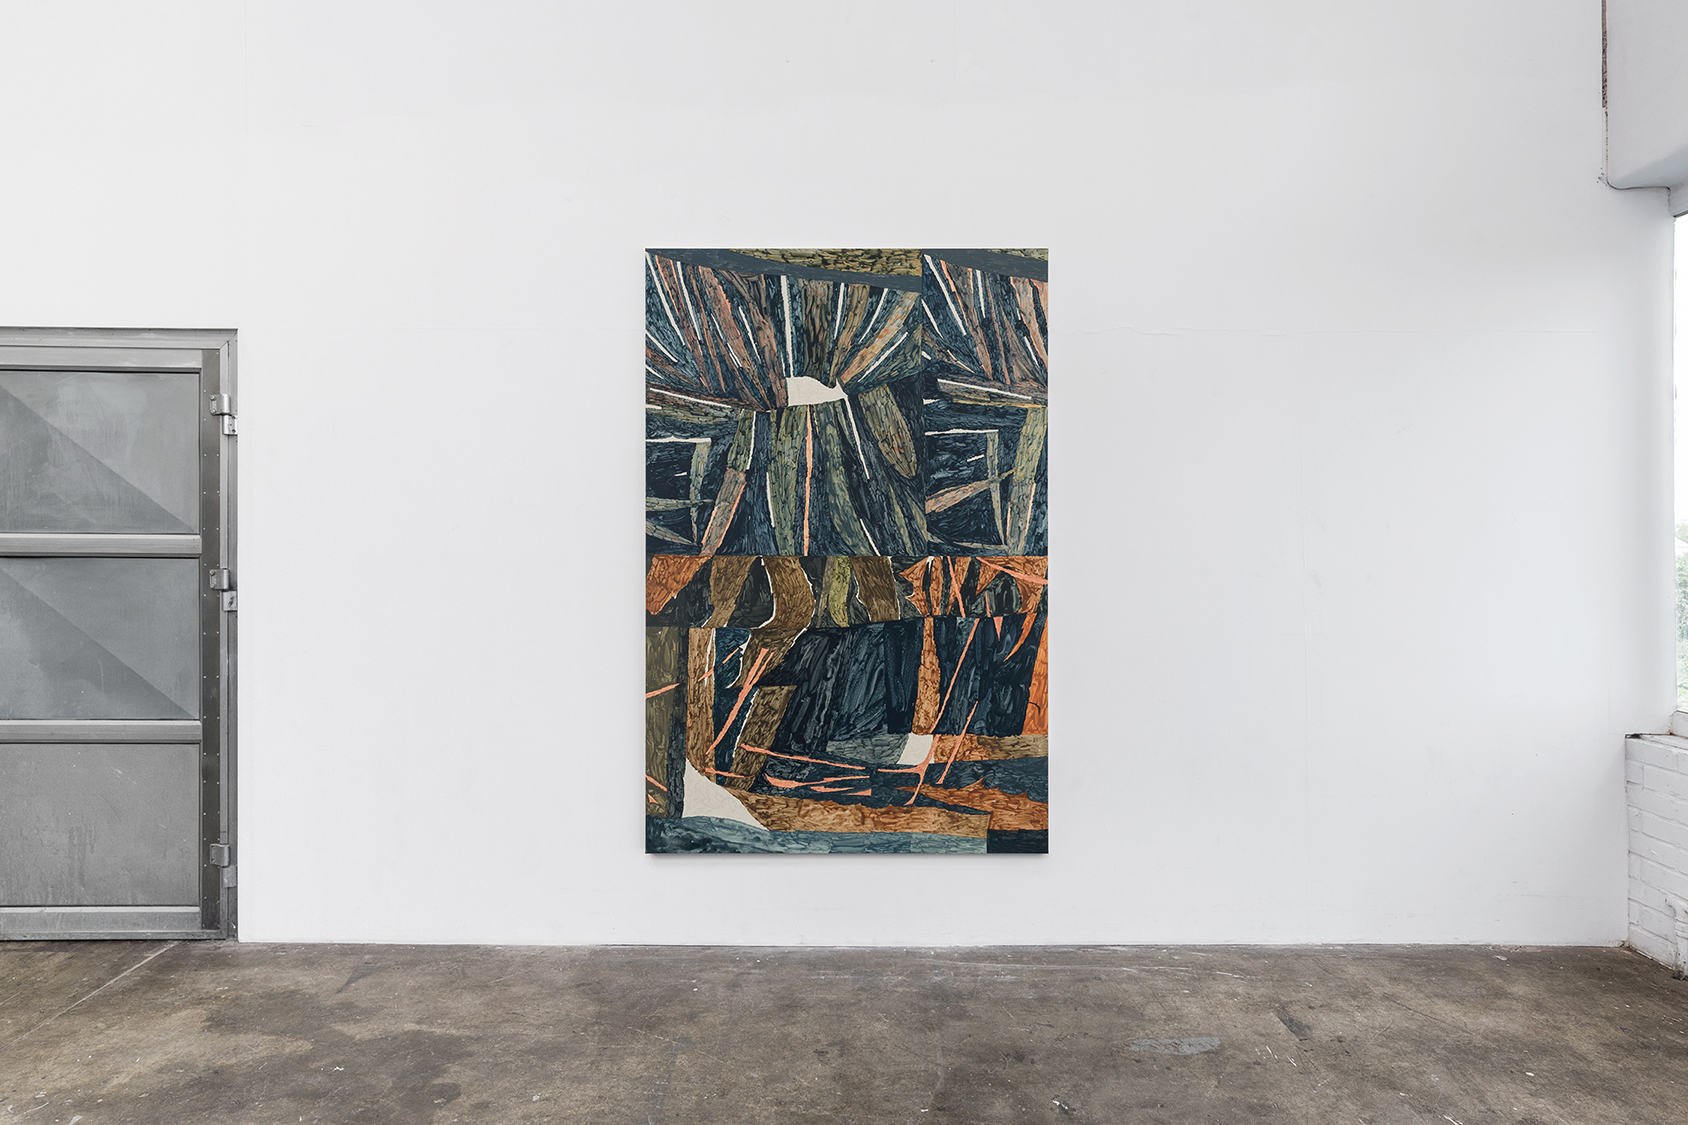 Fredrik Åkum- Exhibition